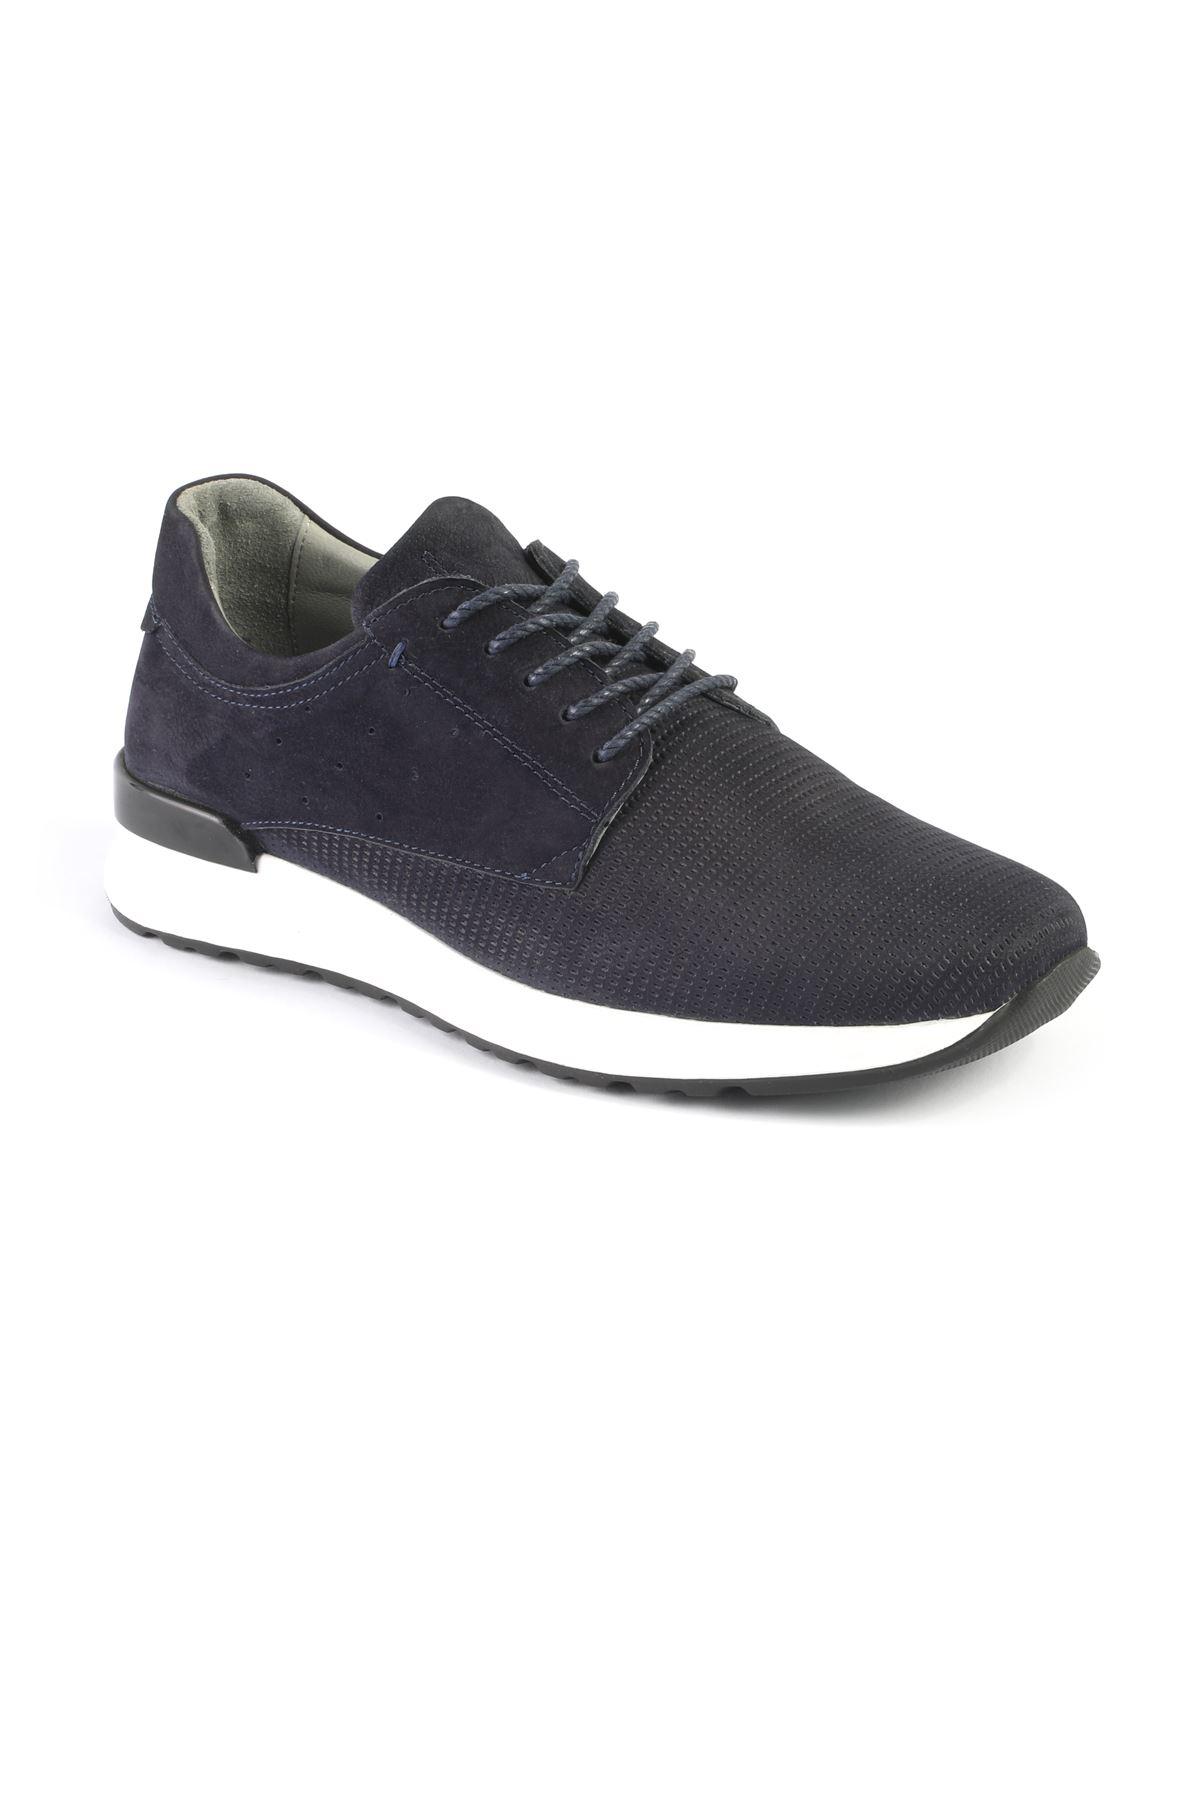 Libero 3046 Navy Blue Sport Shoes